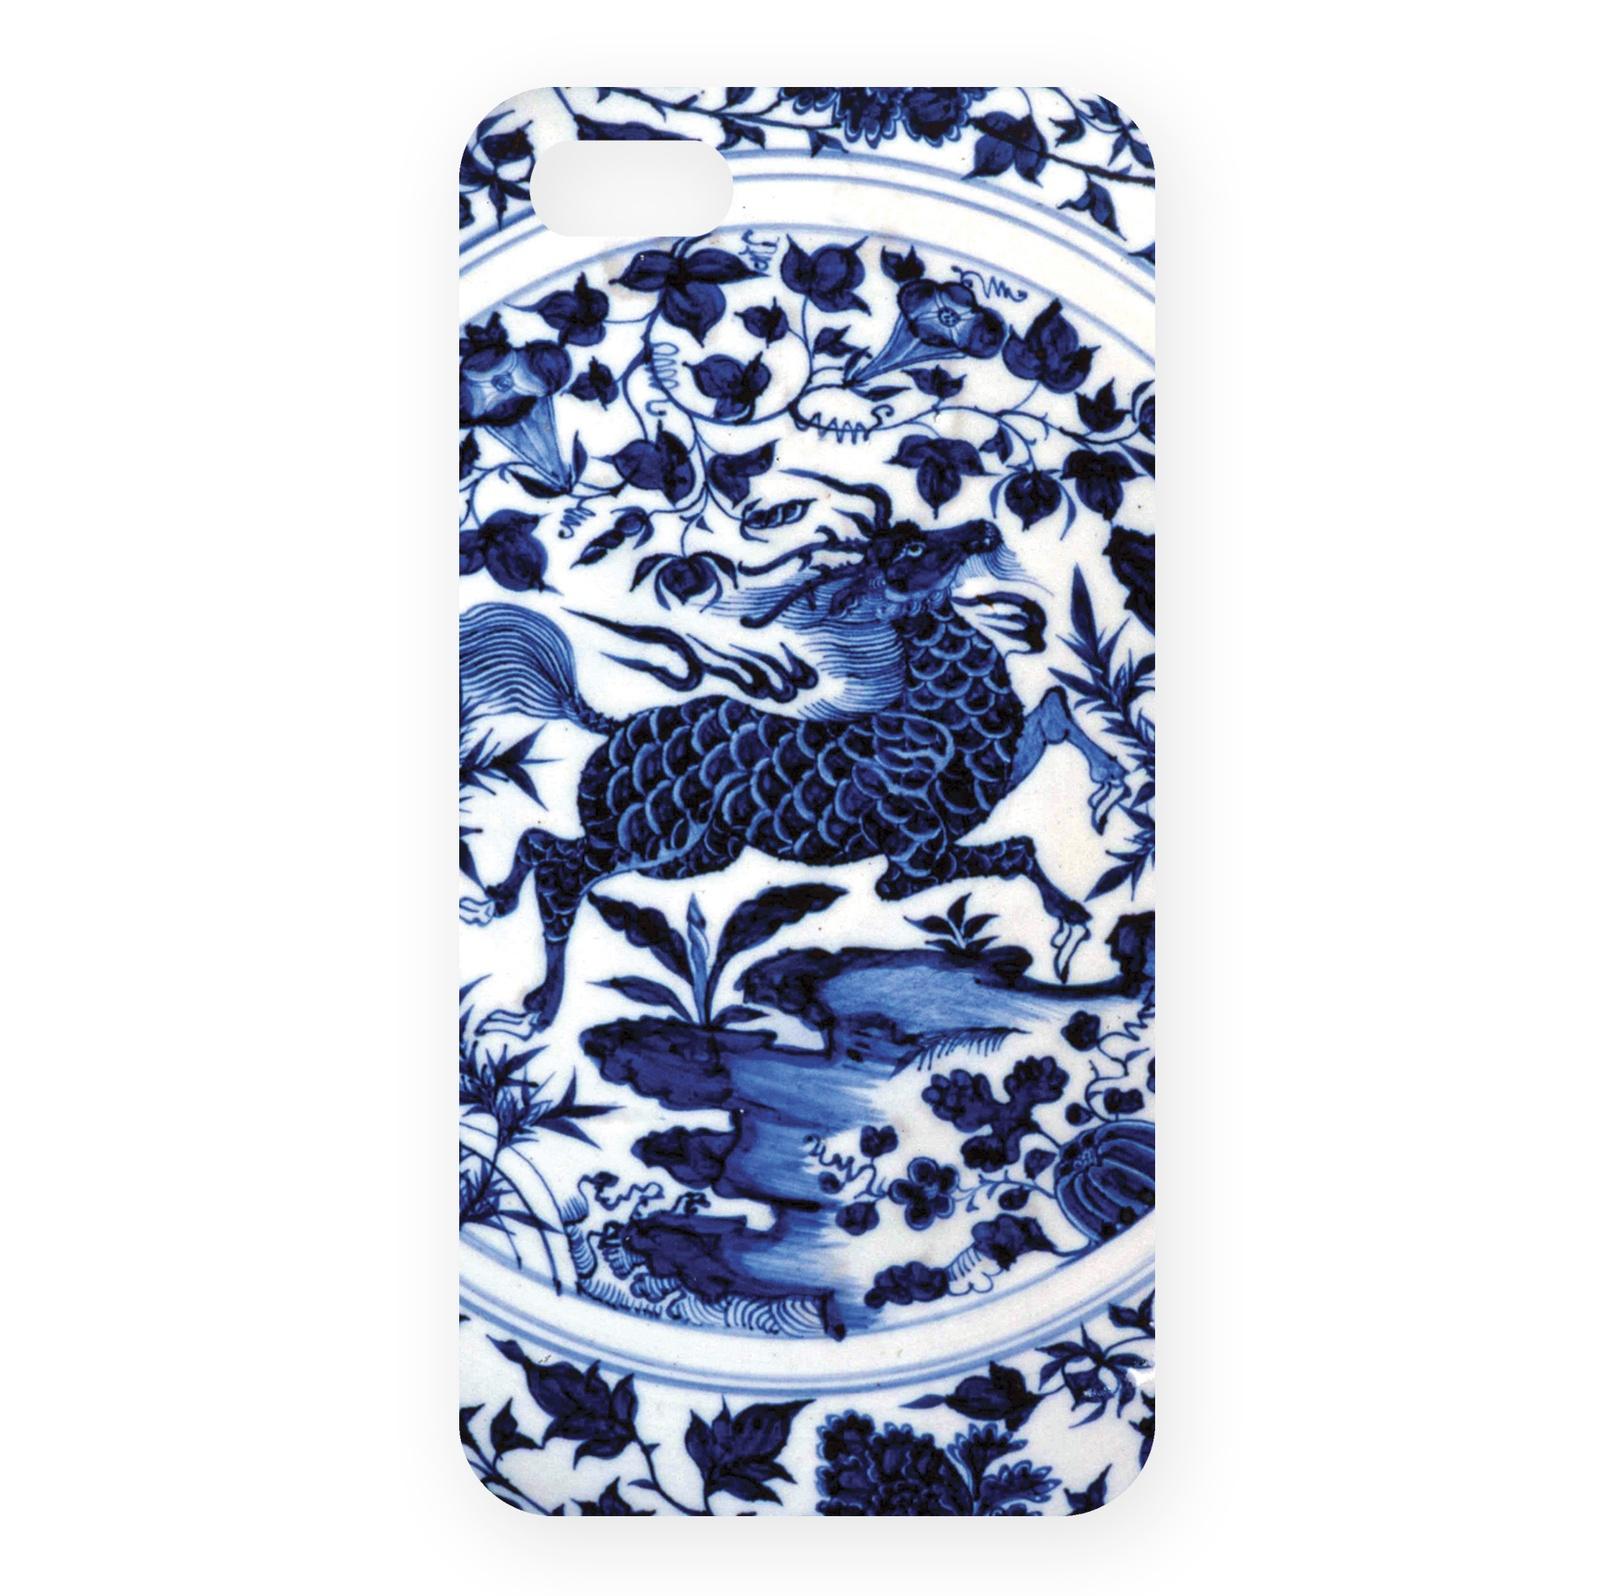 Чехол для сотового телефона Mitya Veselkov IP5.MITYA, IP5.MITYA-244 цена и фото